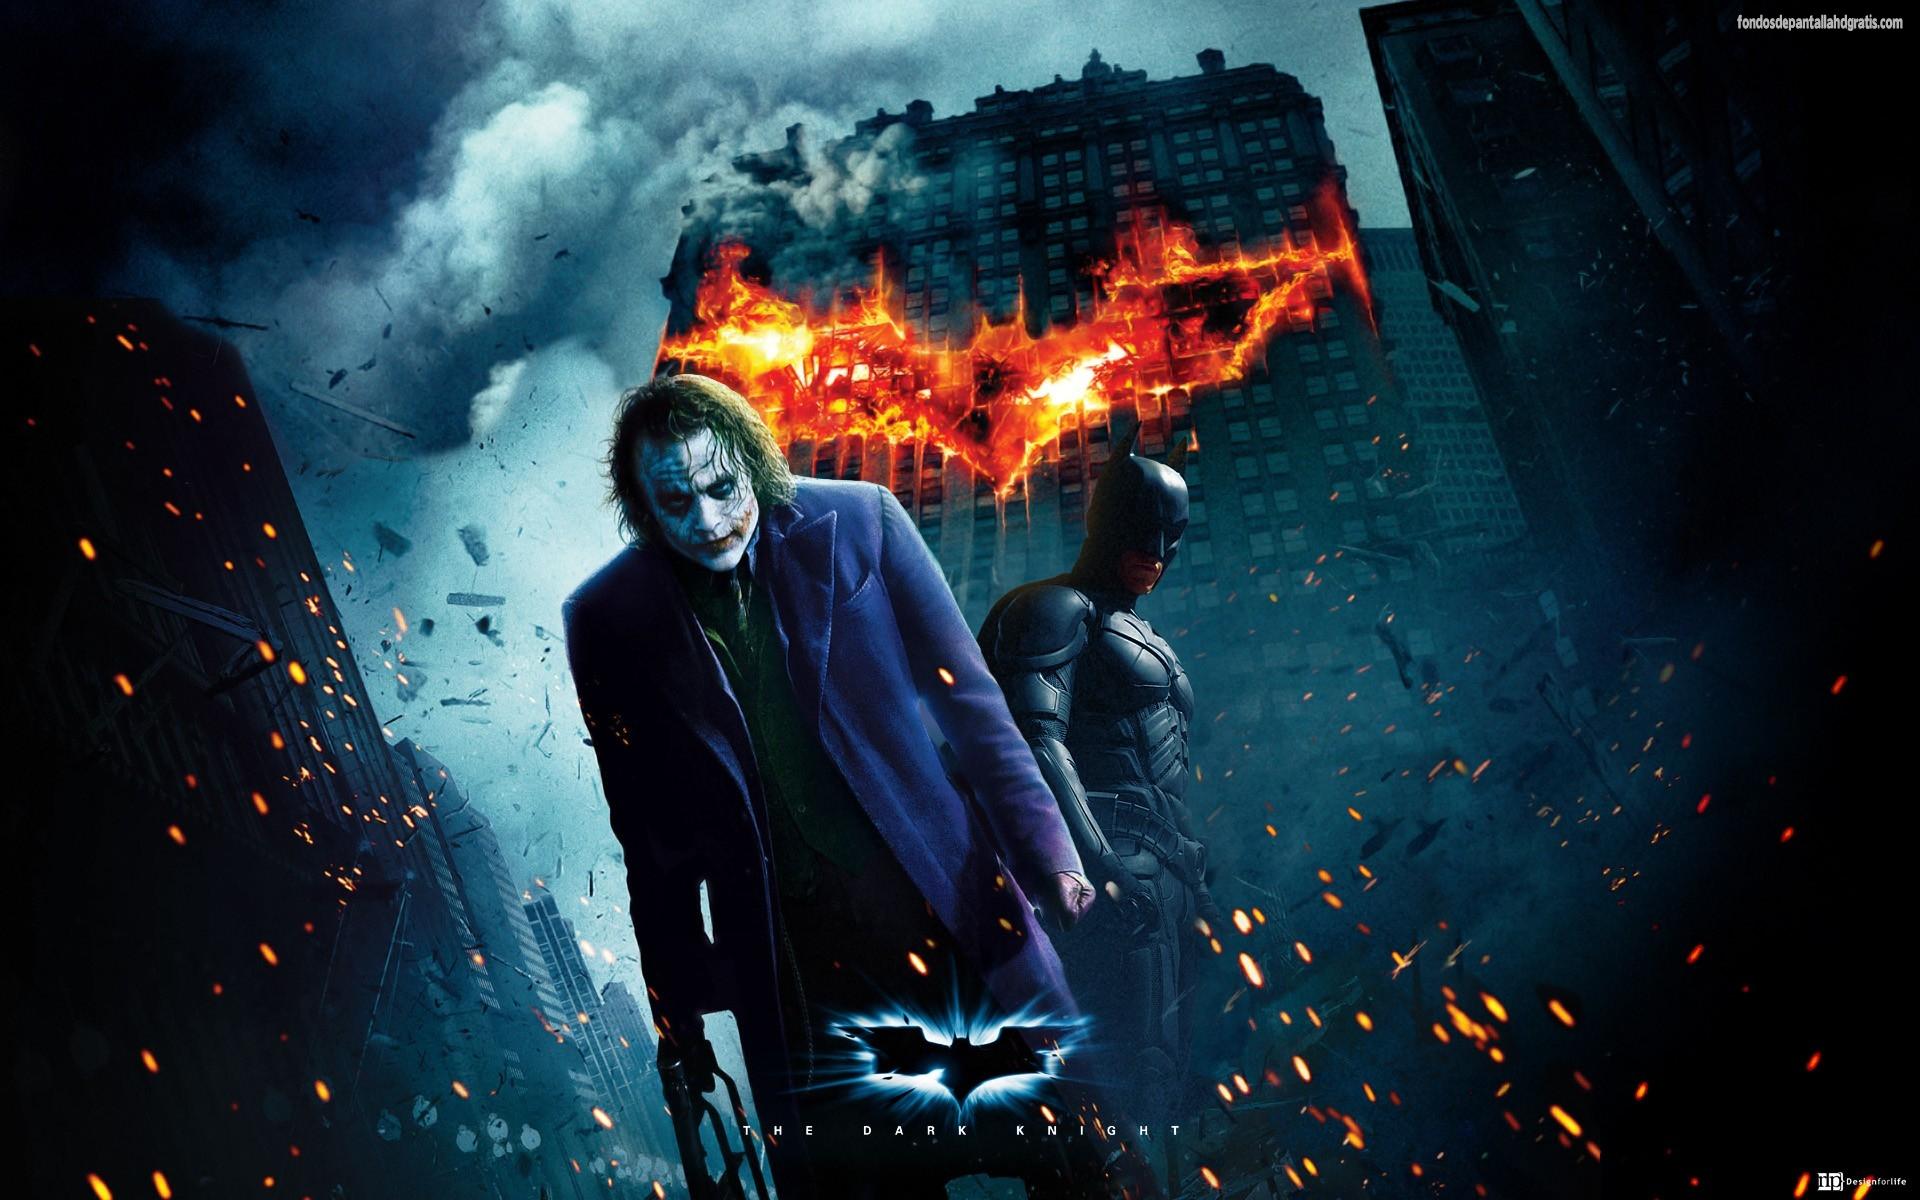 Hd wallpaper of joker - Image Batman The Joker 3d Batman The Dark Knight Hd Wallpapers 12883 Jpg Villains Wiki Fandom Powered By Wikia